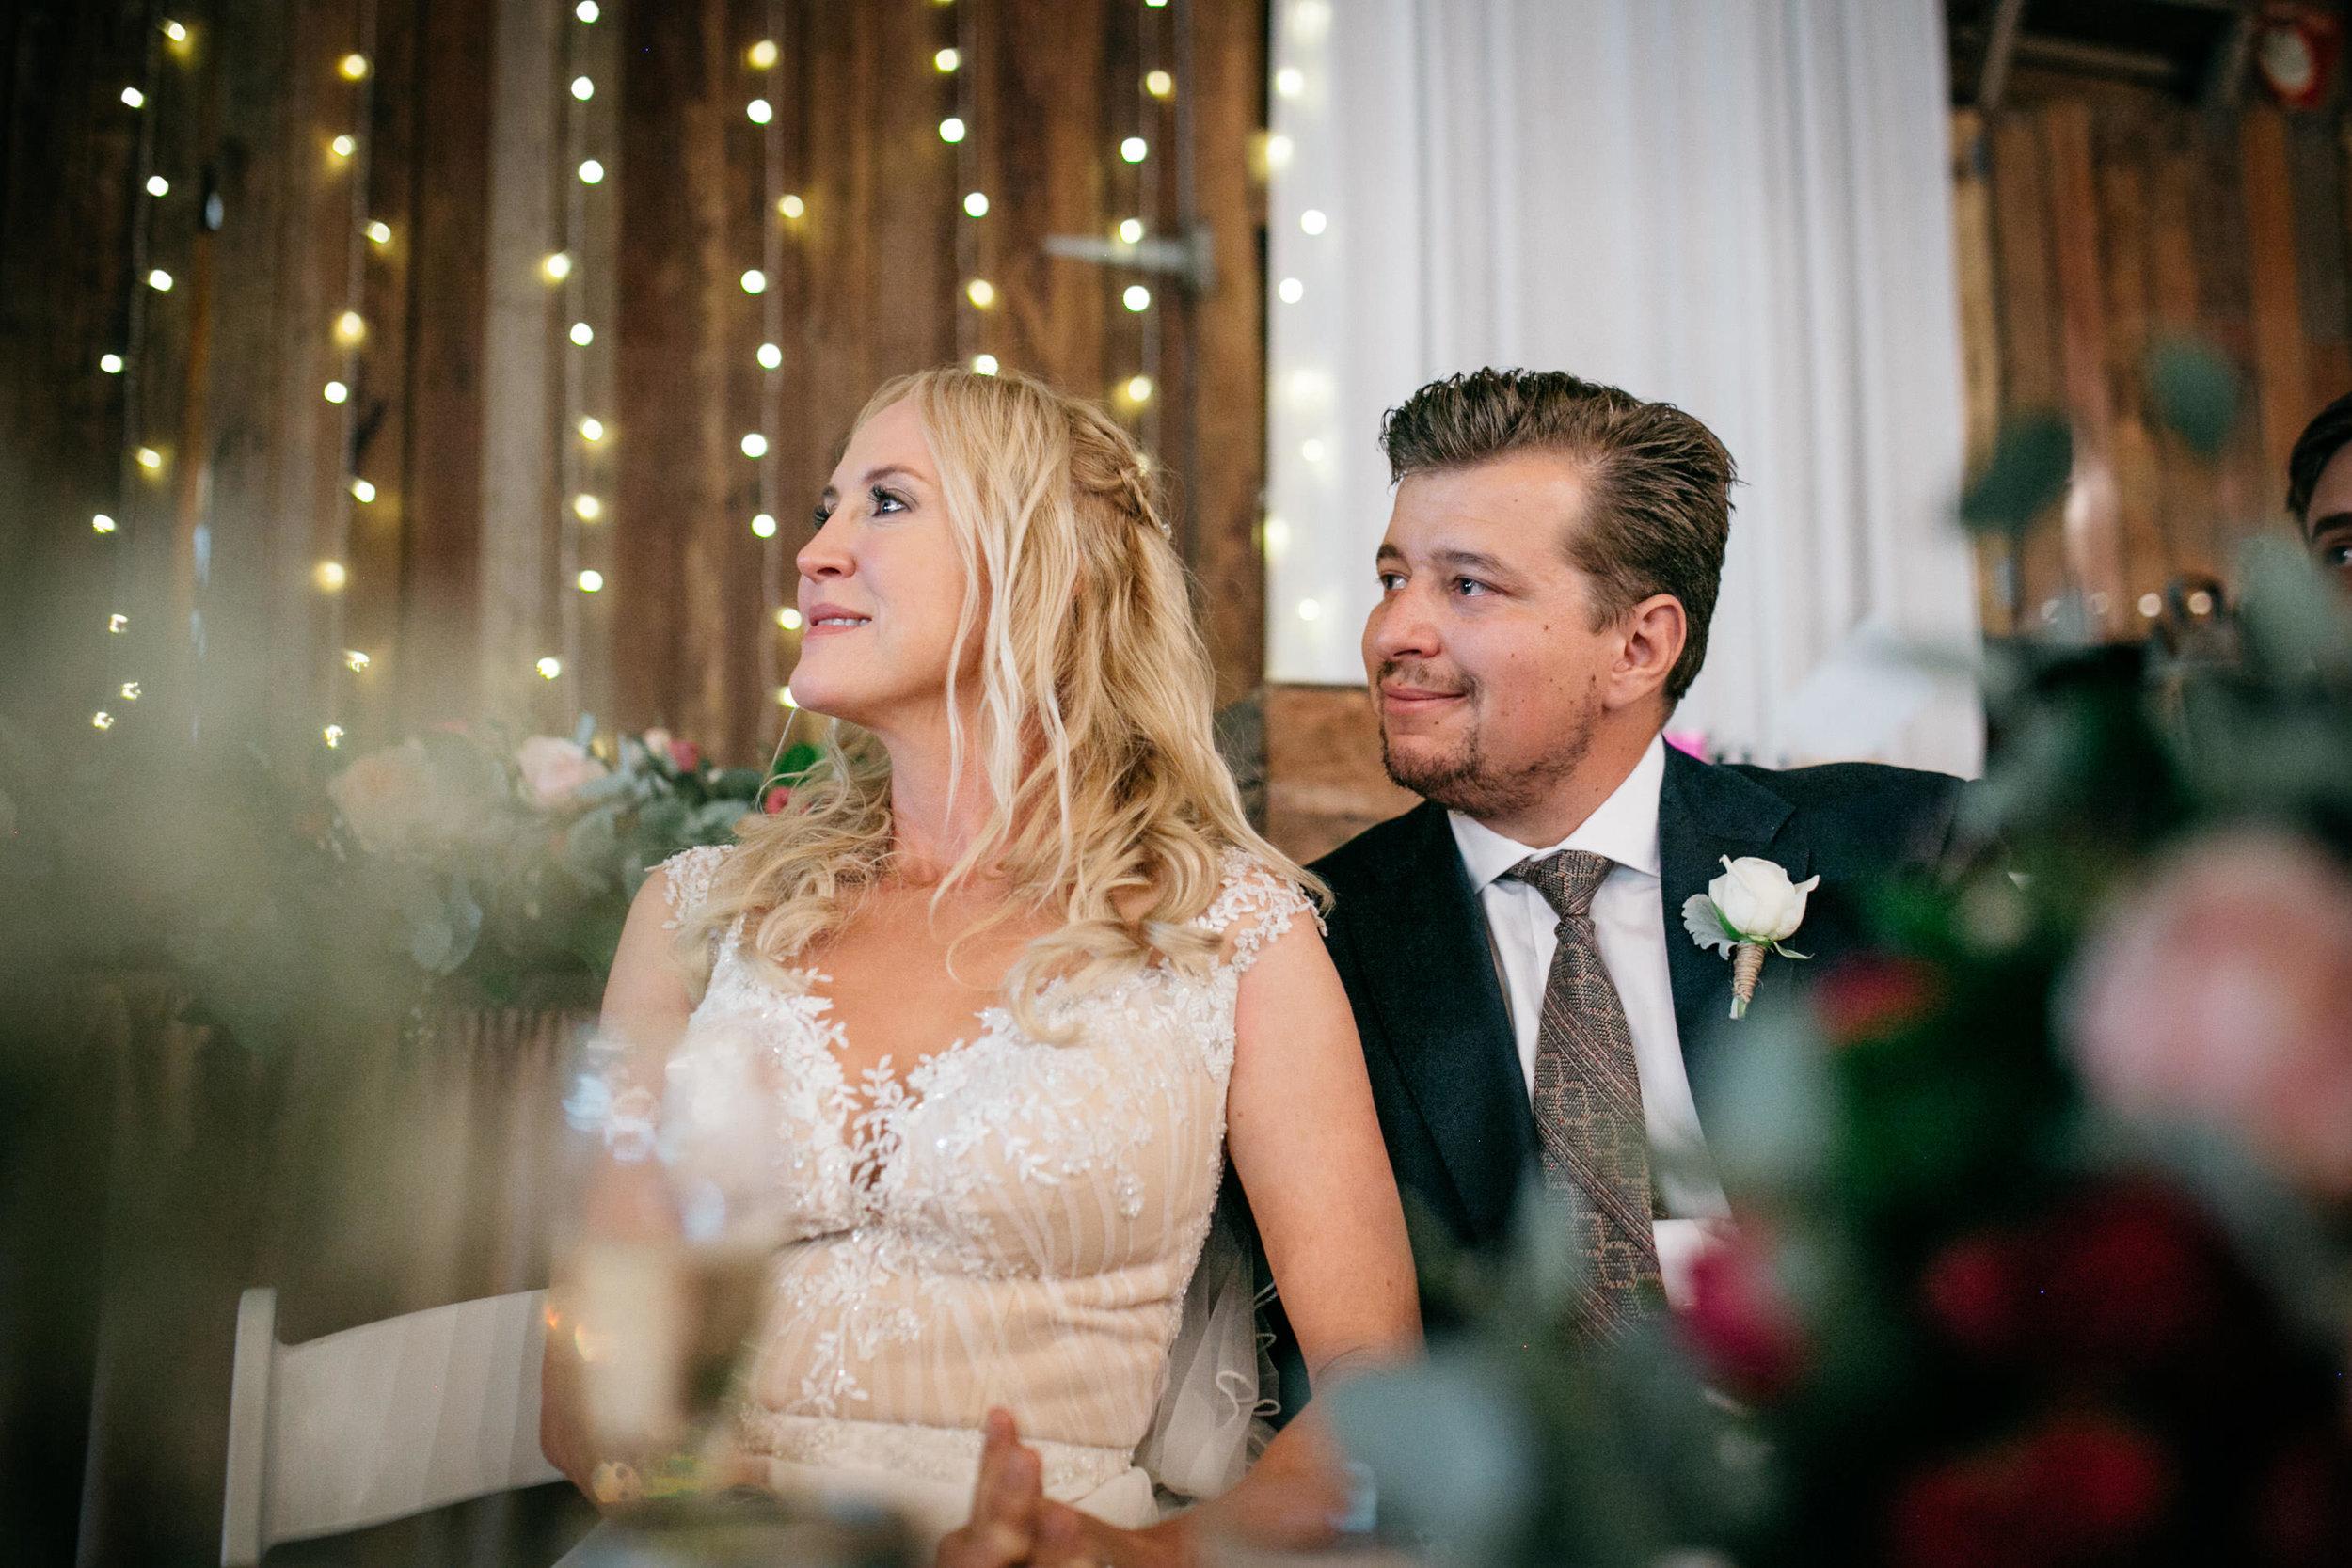 True North Photography_Boomerang Farm_Stacey and Isaac_Gold Coast Wedding_Barm Wedding_Hinterland Wedding-199.jpg